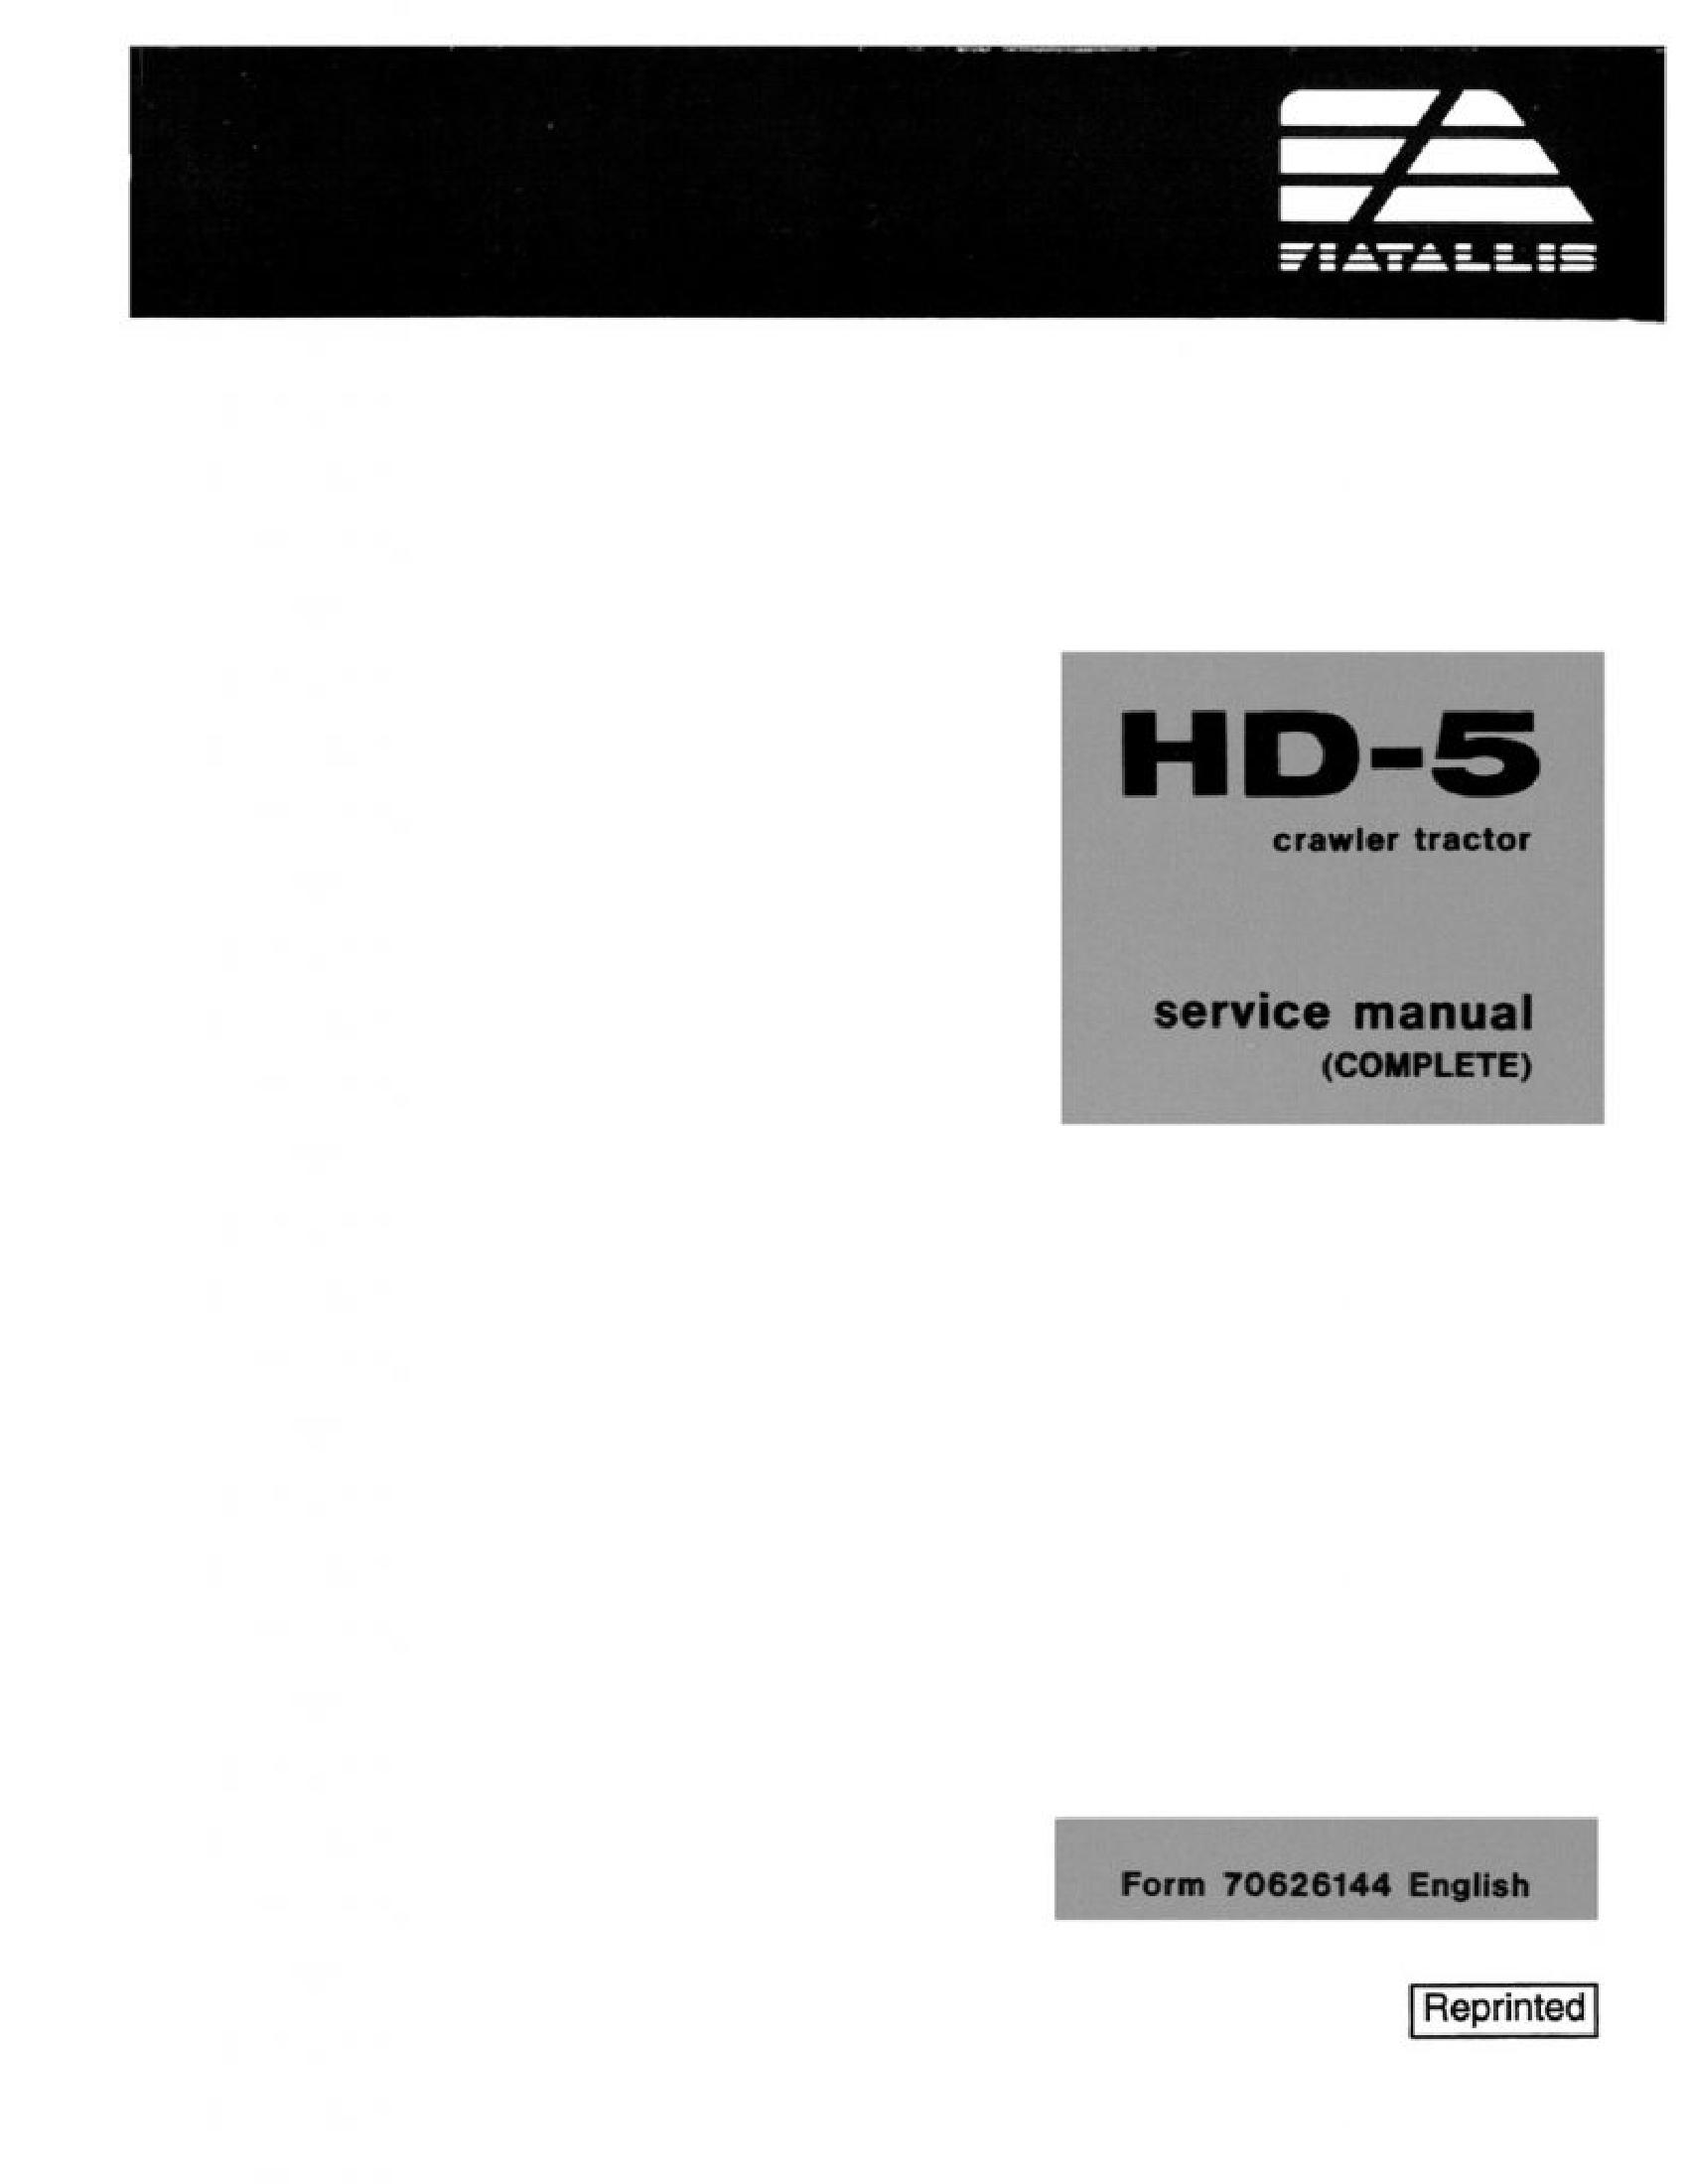 Fiat-Allis HD-5 Crawler Tractor manual